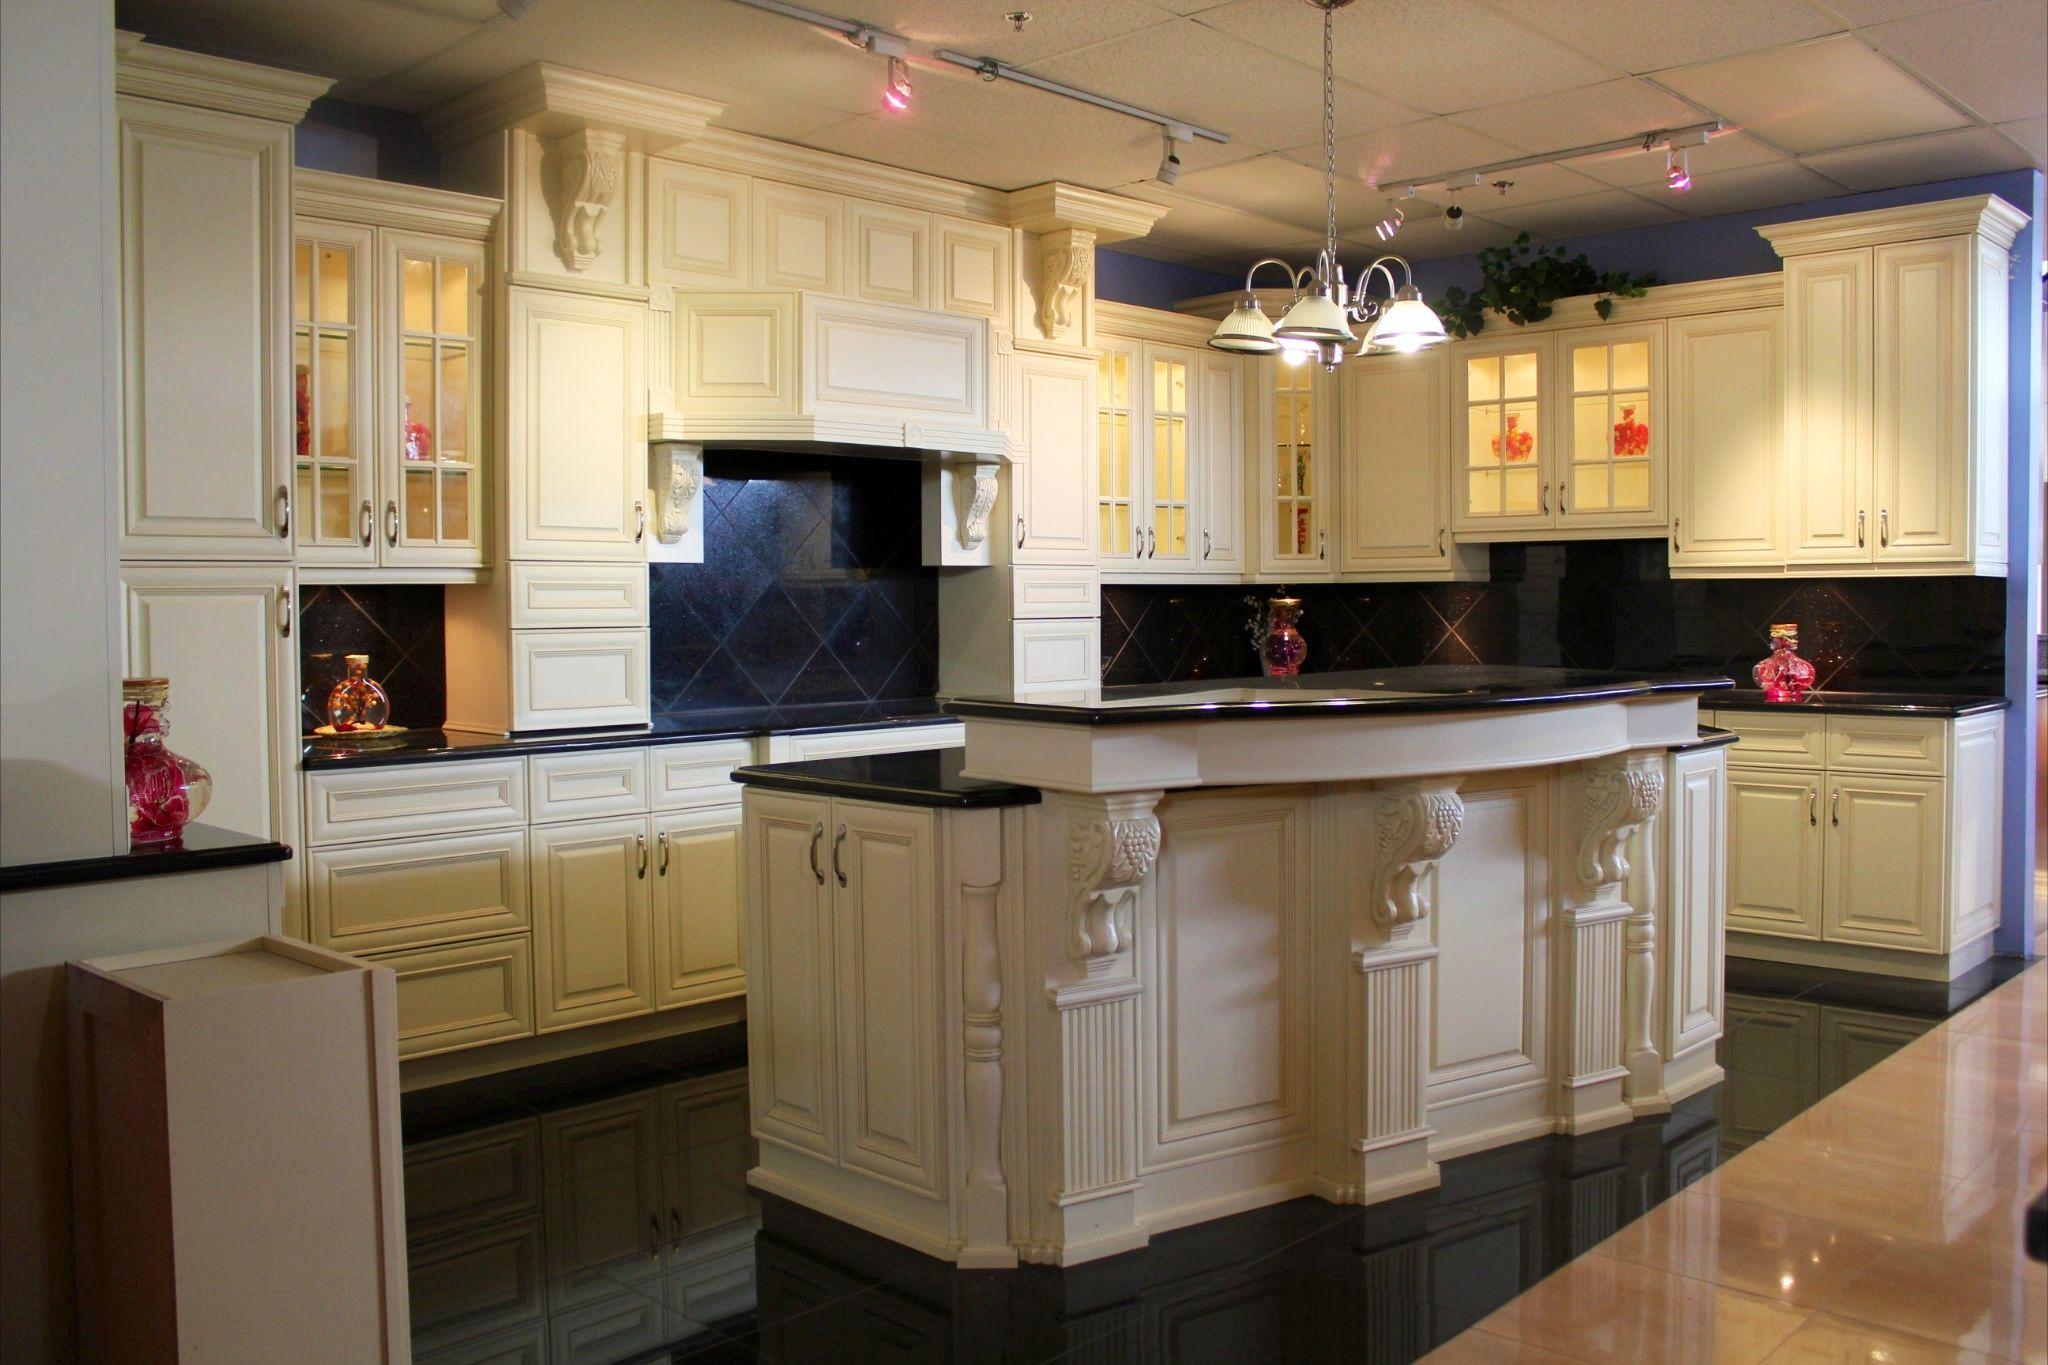 White kitchen cabinets black floor White kitchen